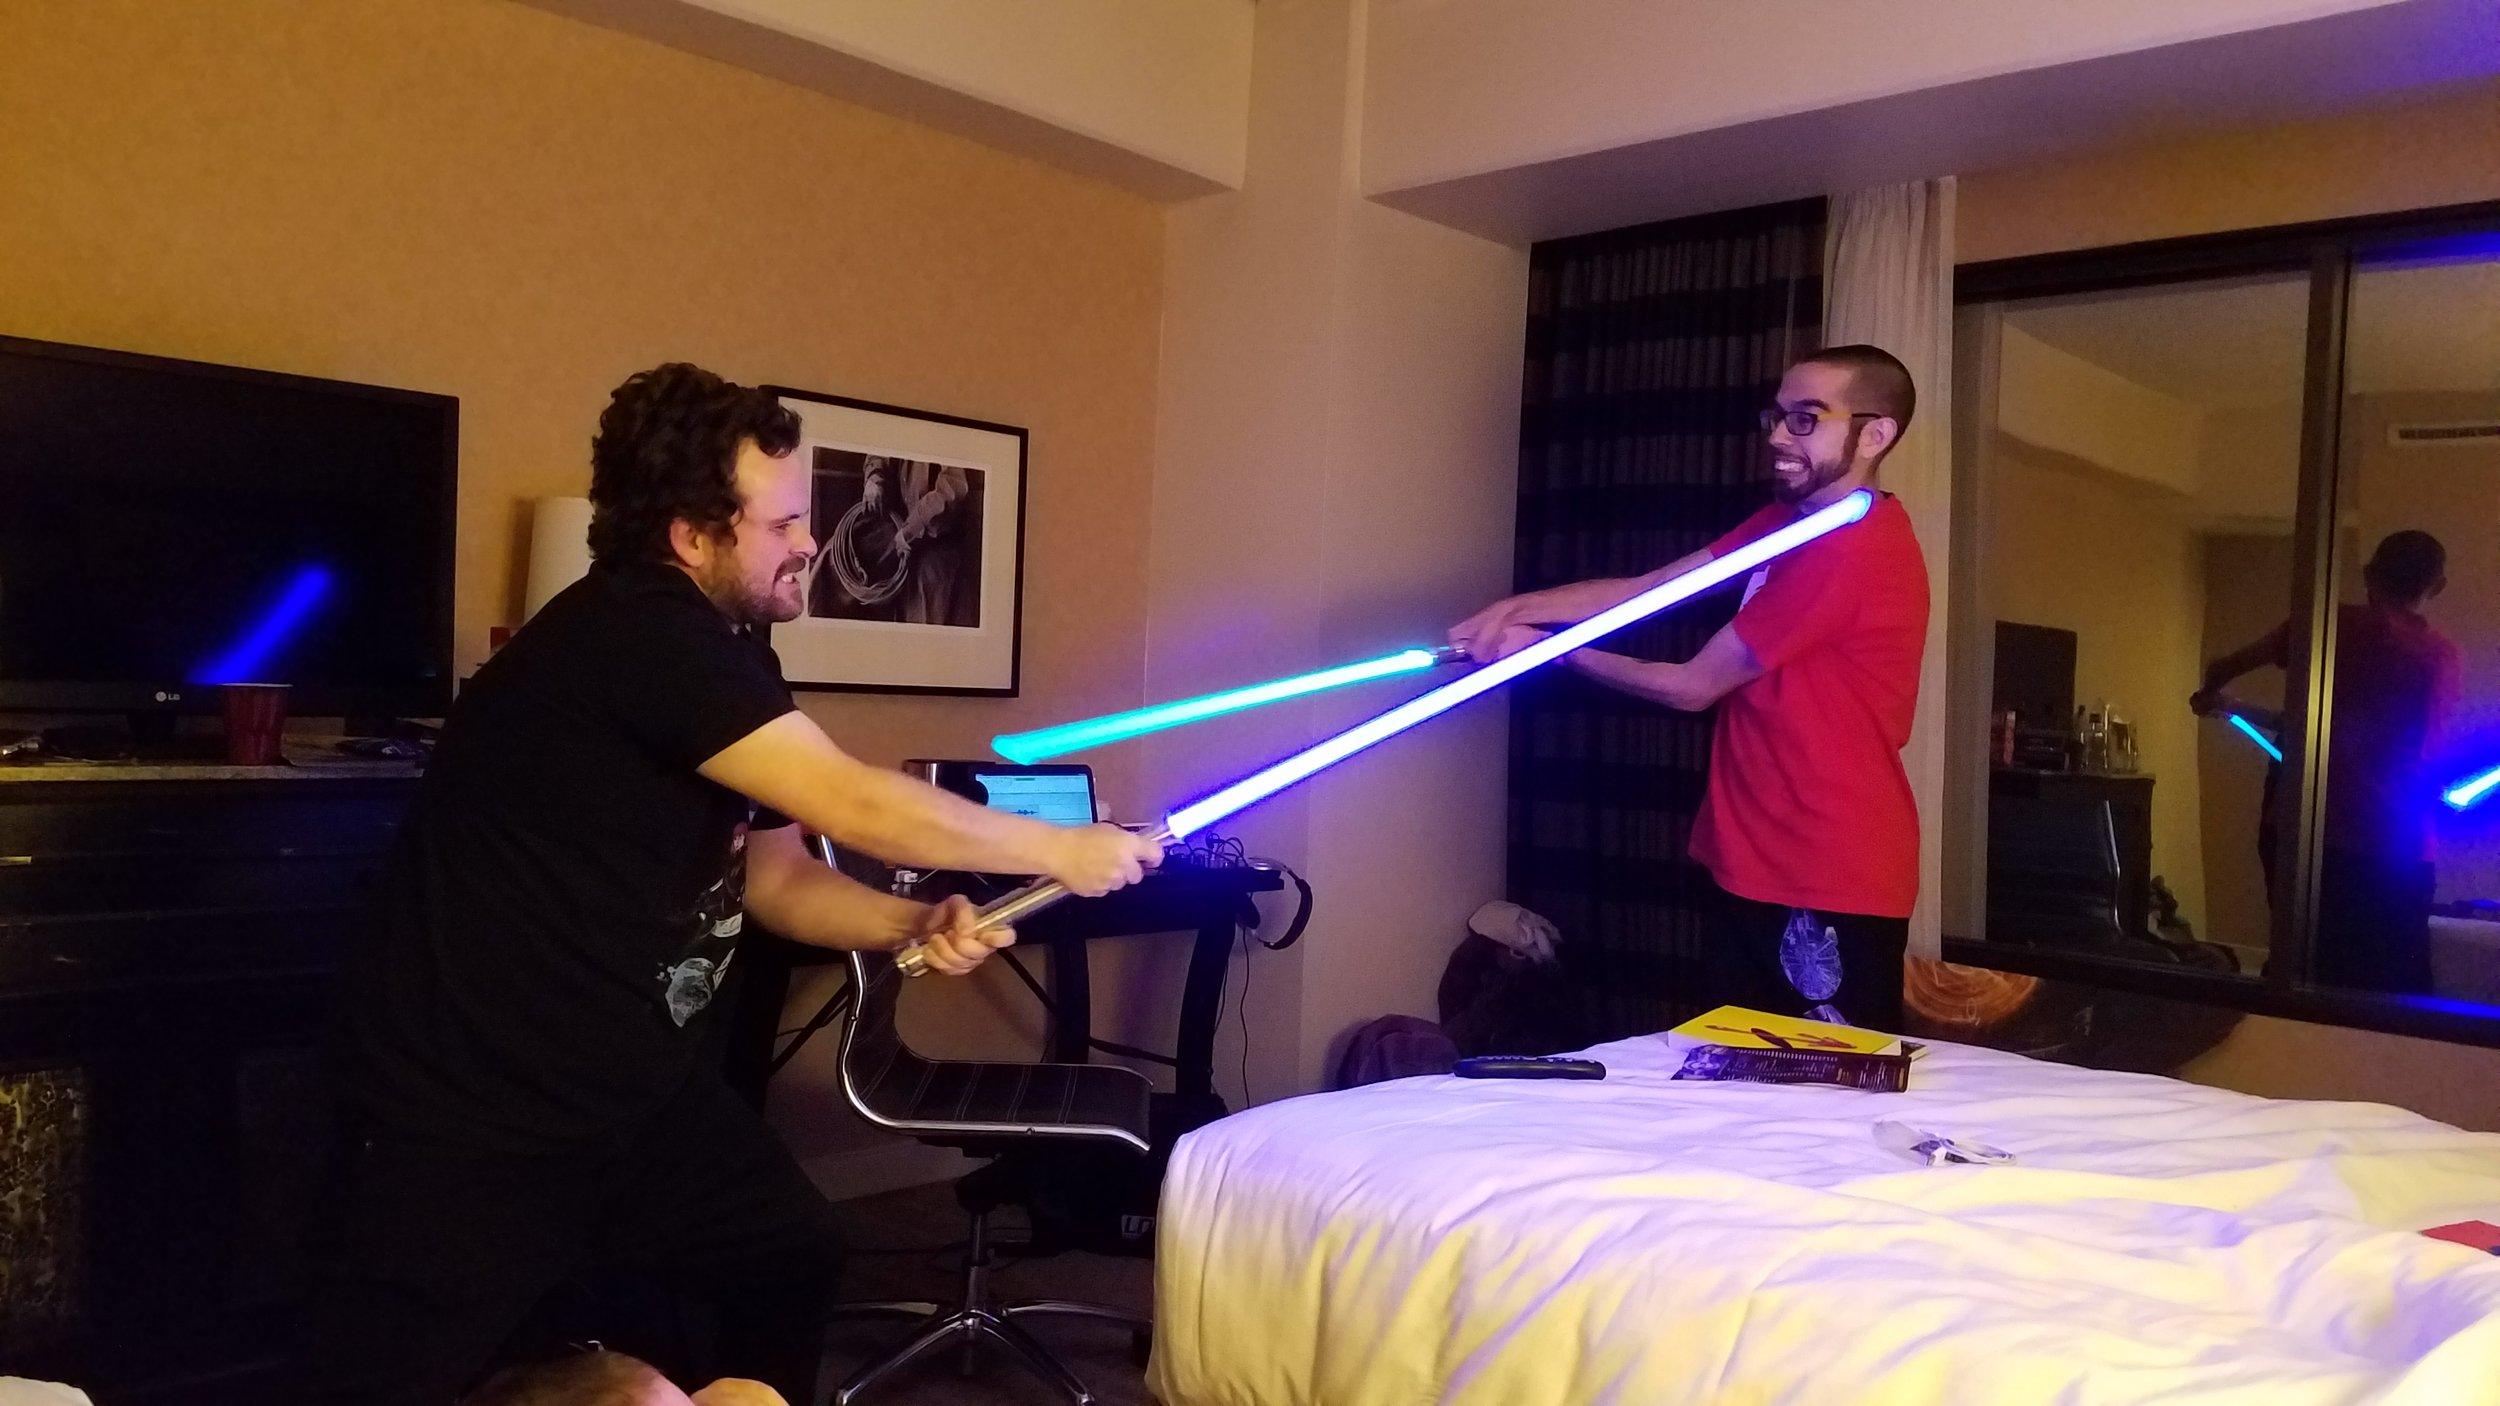 - Lightsaber Fight!